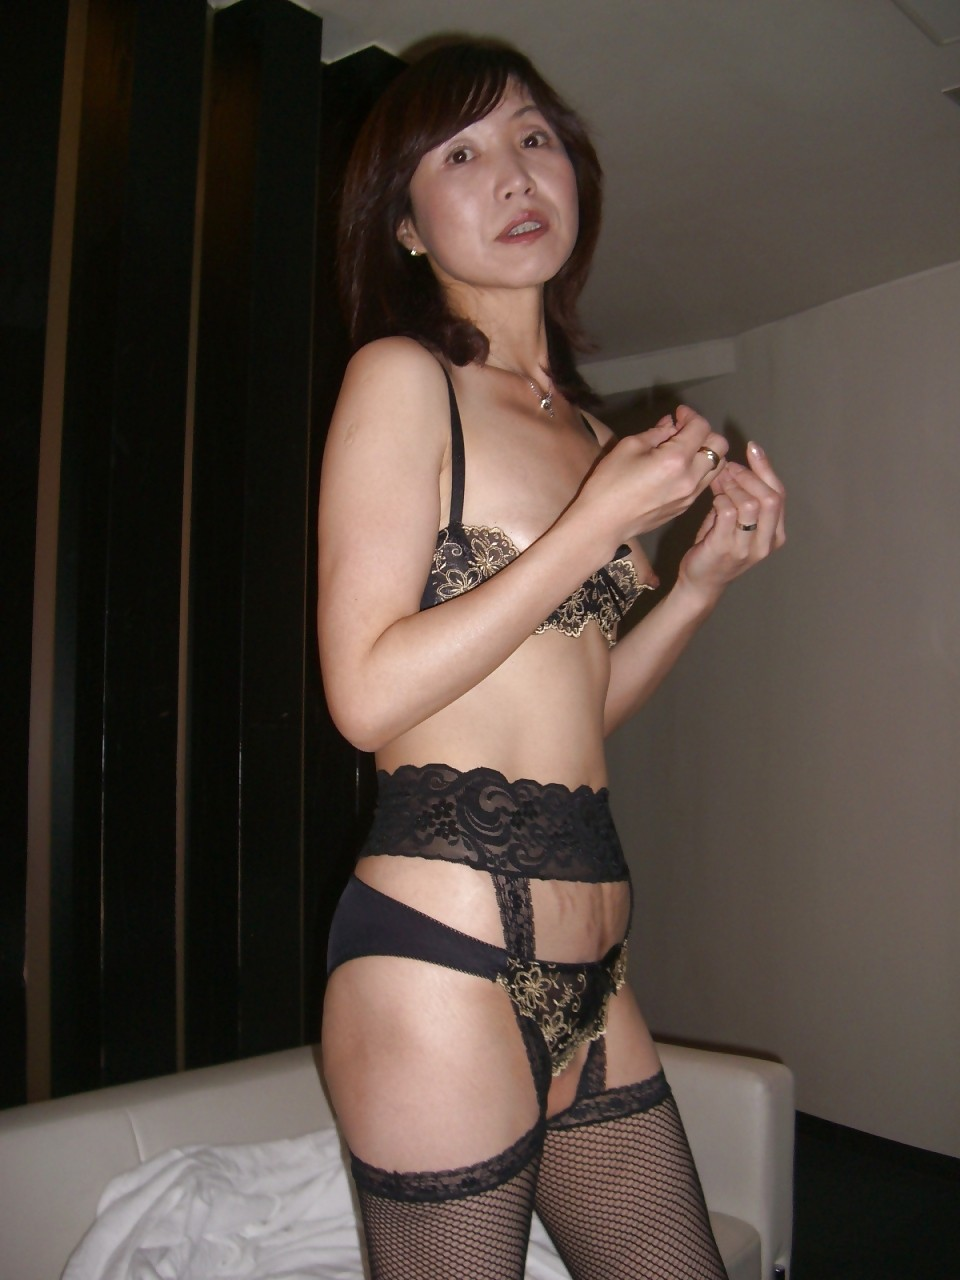 mature asian milf amateur mature porn wife photo asian japanese